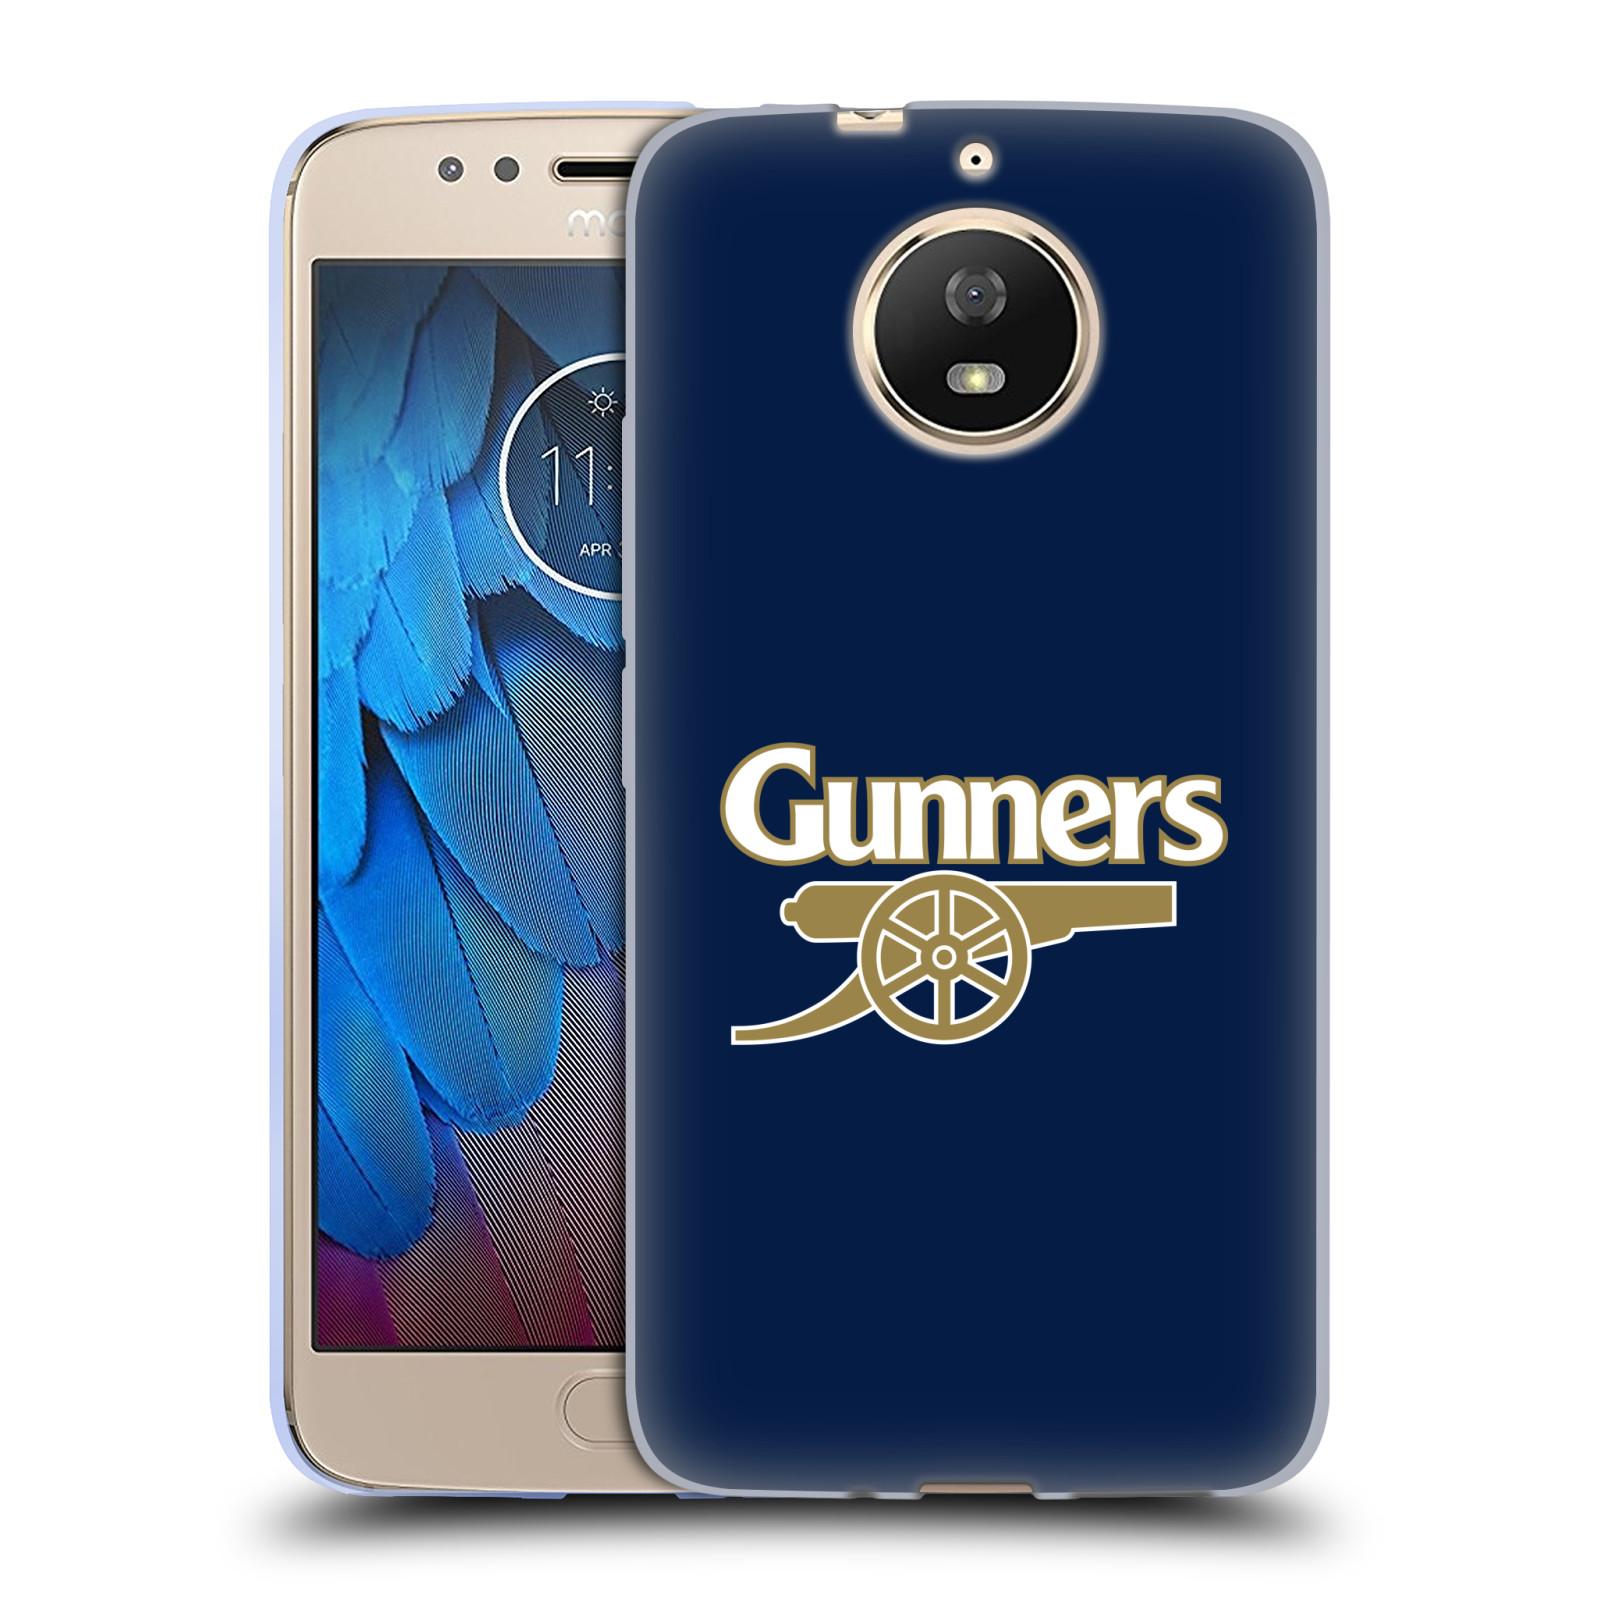 Silikonové pouzdro na mobil Lenovo Moto G5s - Head Case - Arsenal FC - Gunners